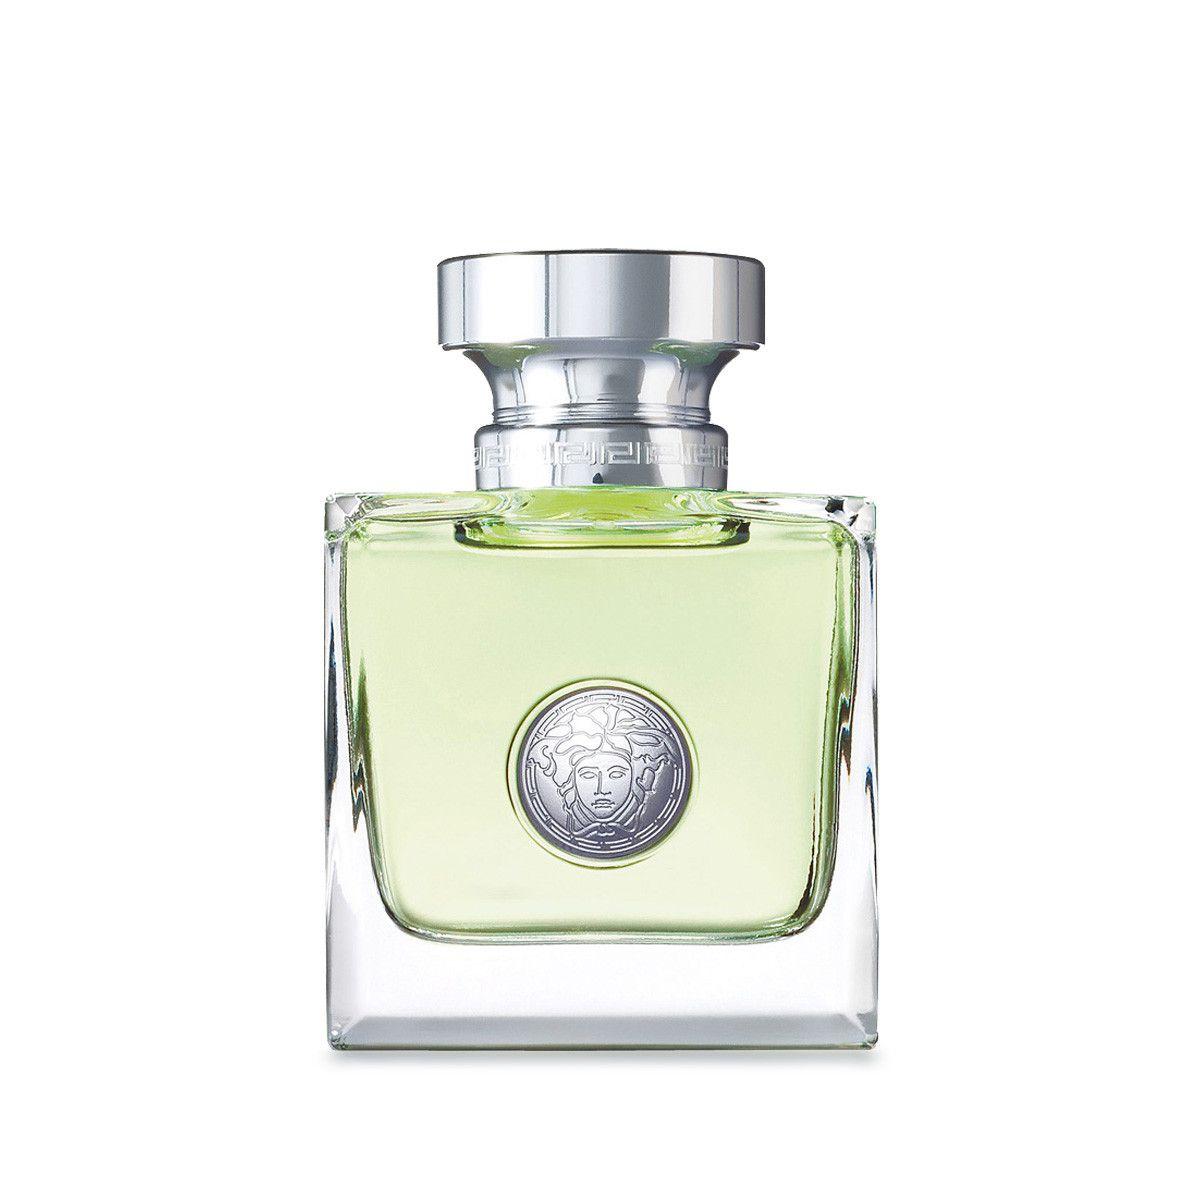 Versace Versence - Perfume Feminino Eau de Toilette 30ml